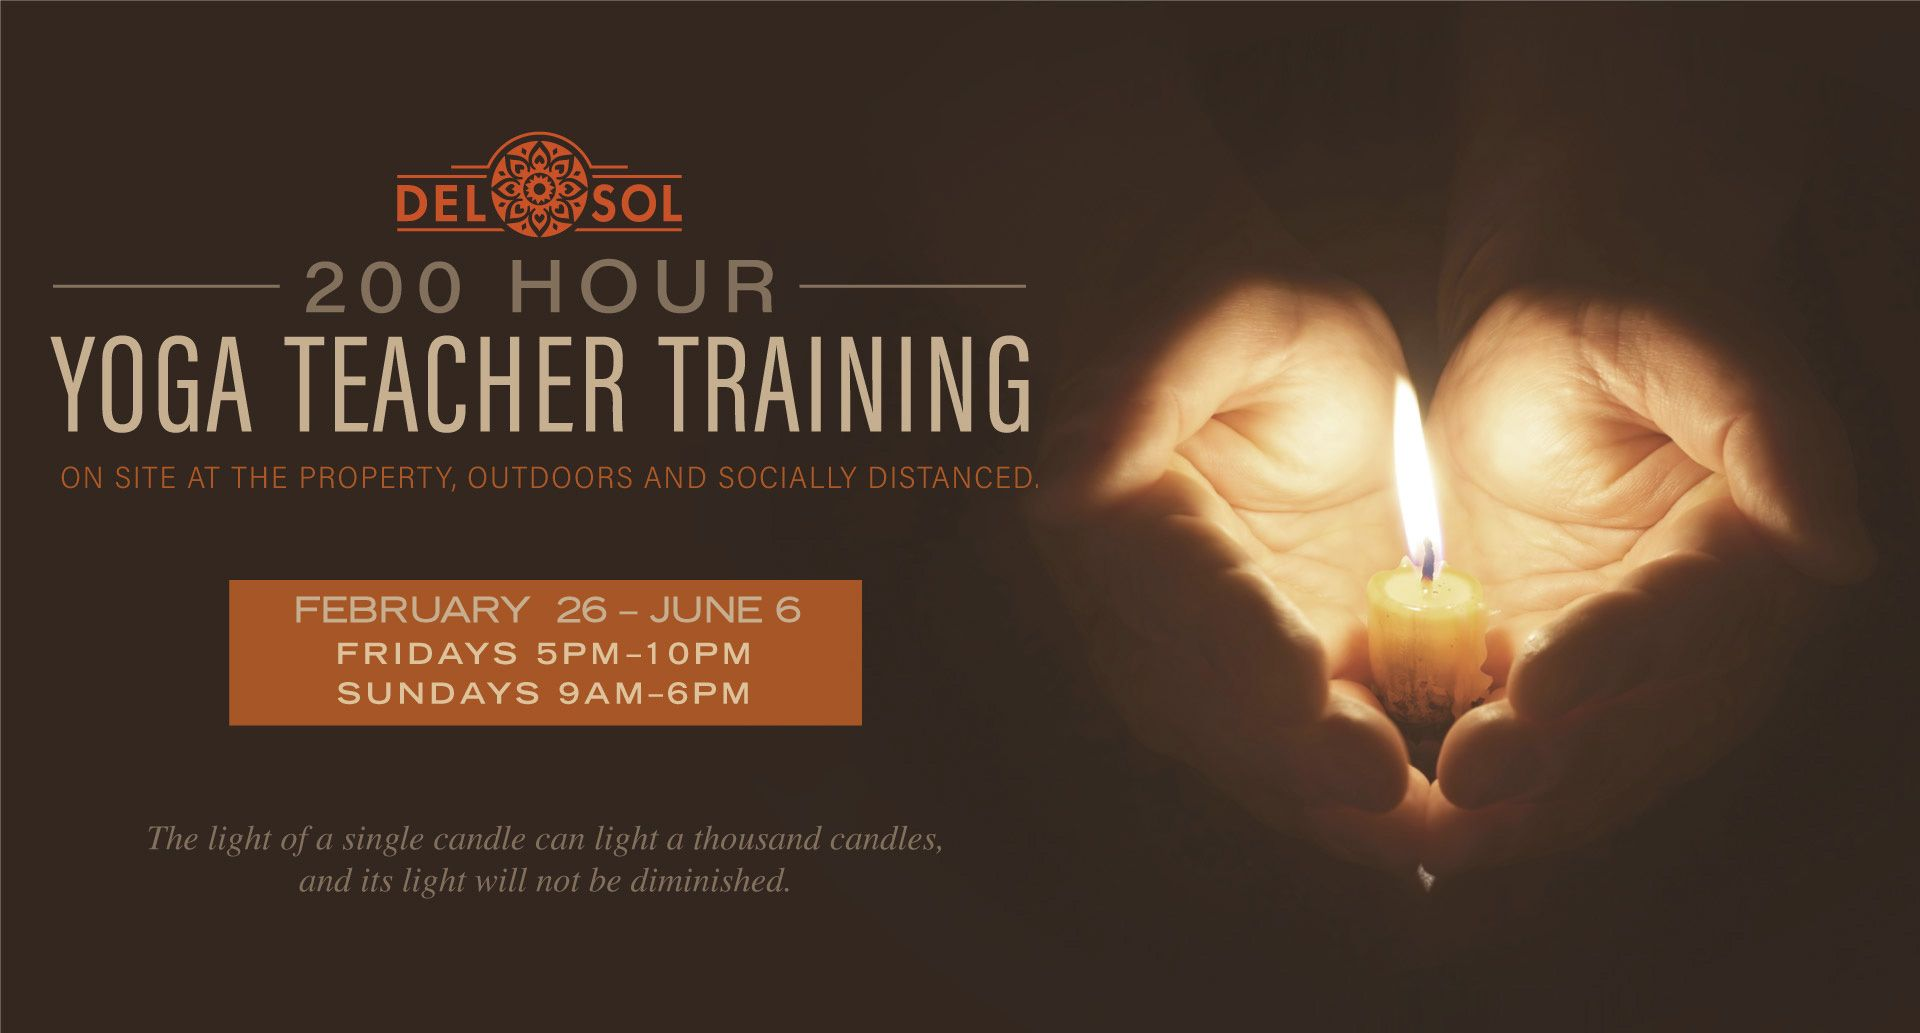 Del Sol 200 Hour Yoga Teacher Training